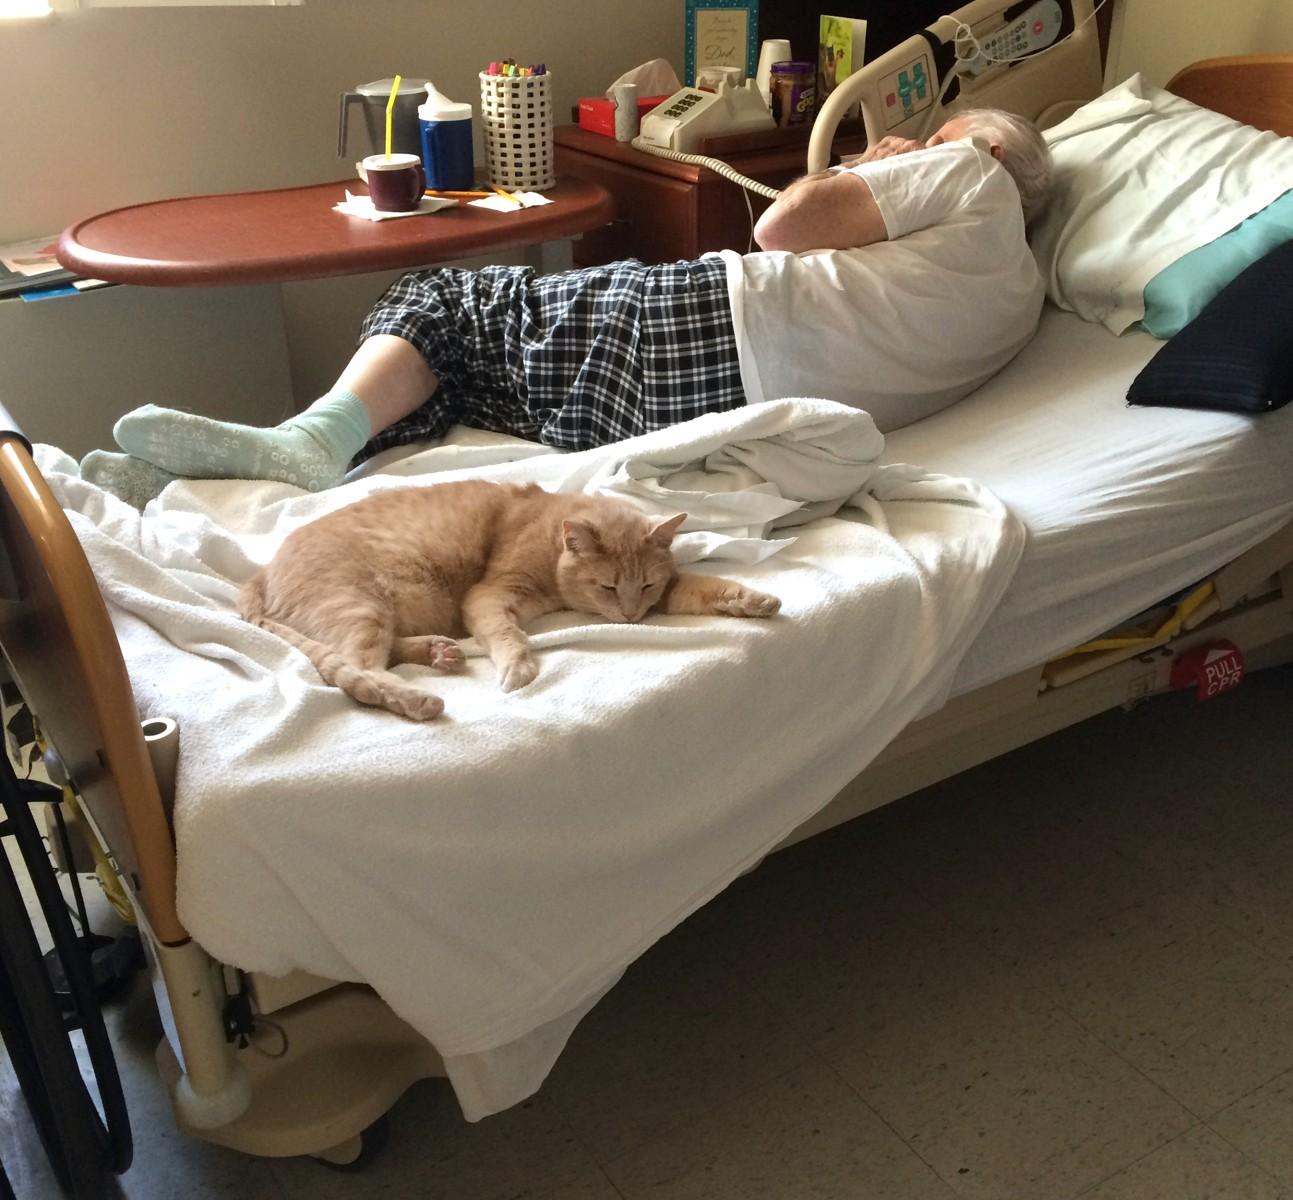 Cat Comforts Ailing Veterans